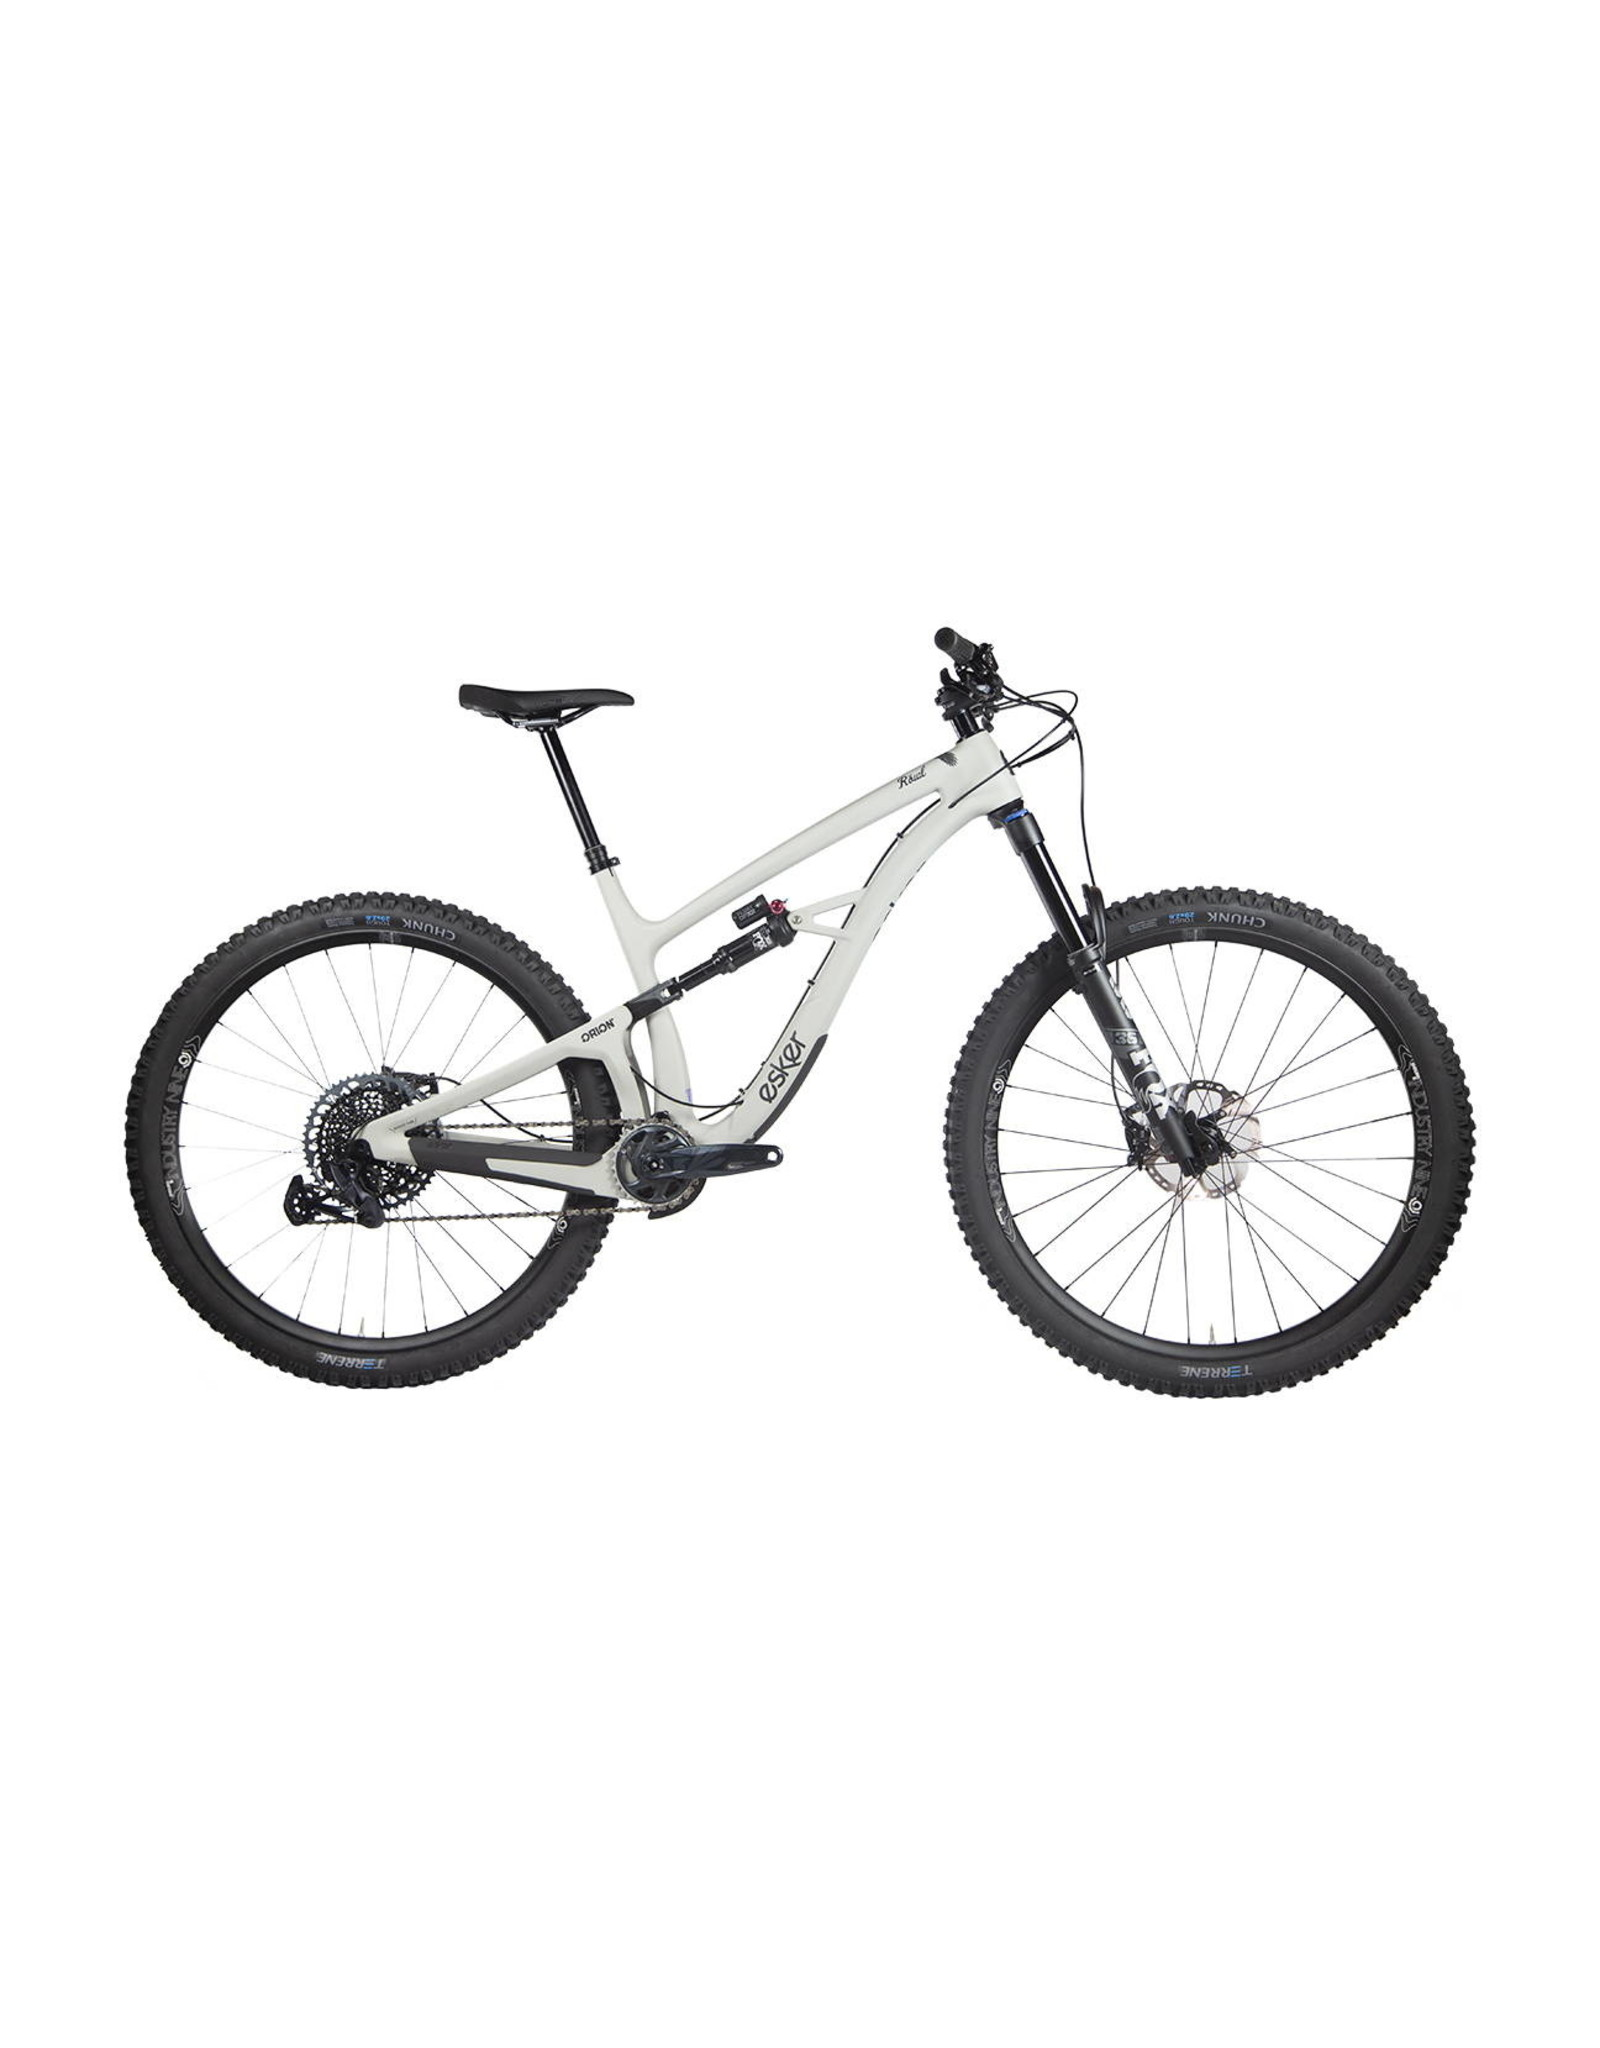 Esker Rowl Complete Bike R3 (Shim XT/Fox Factory)